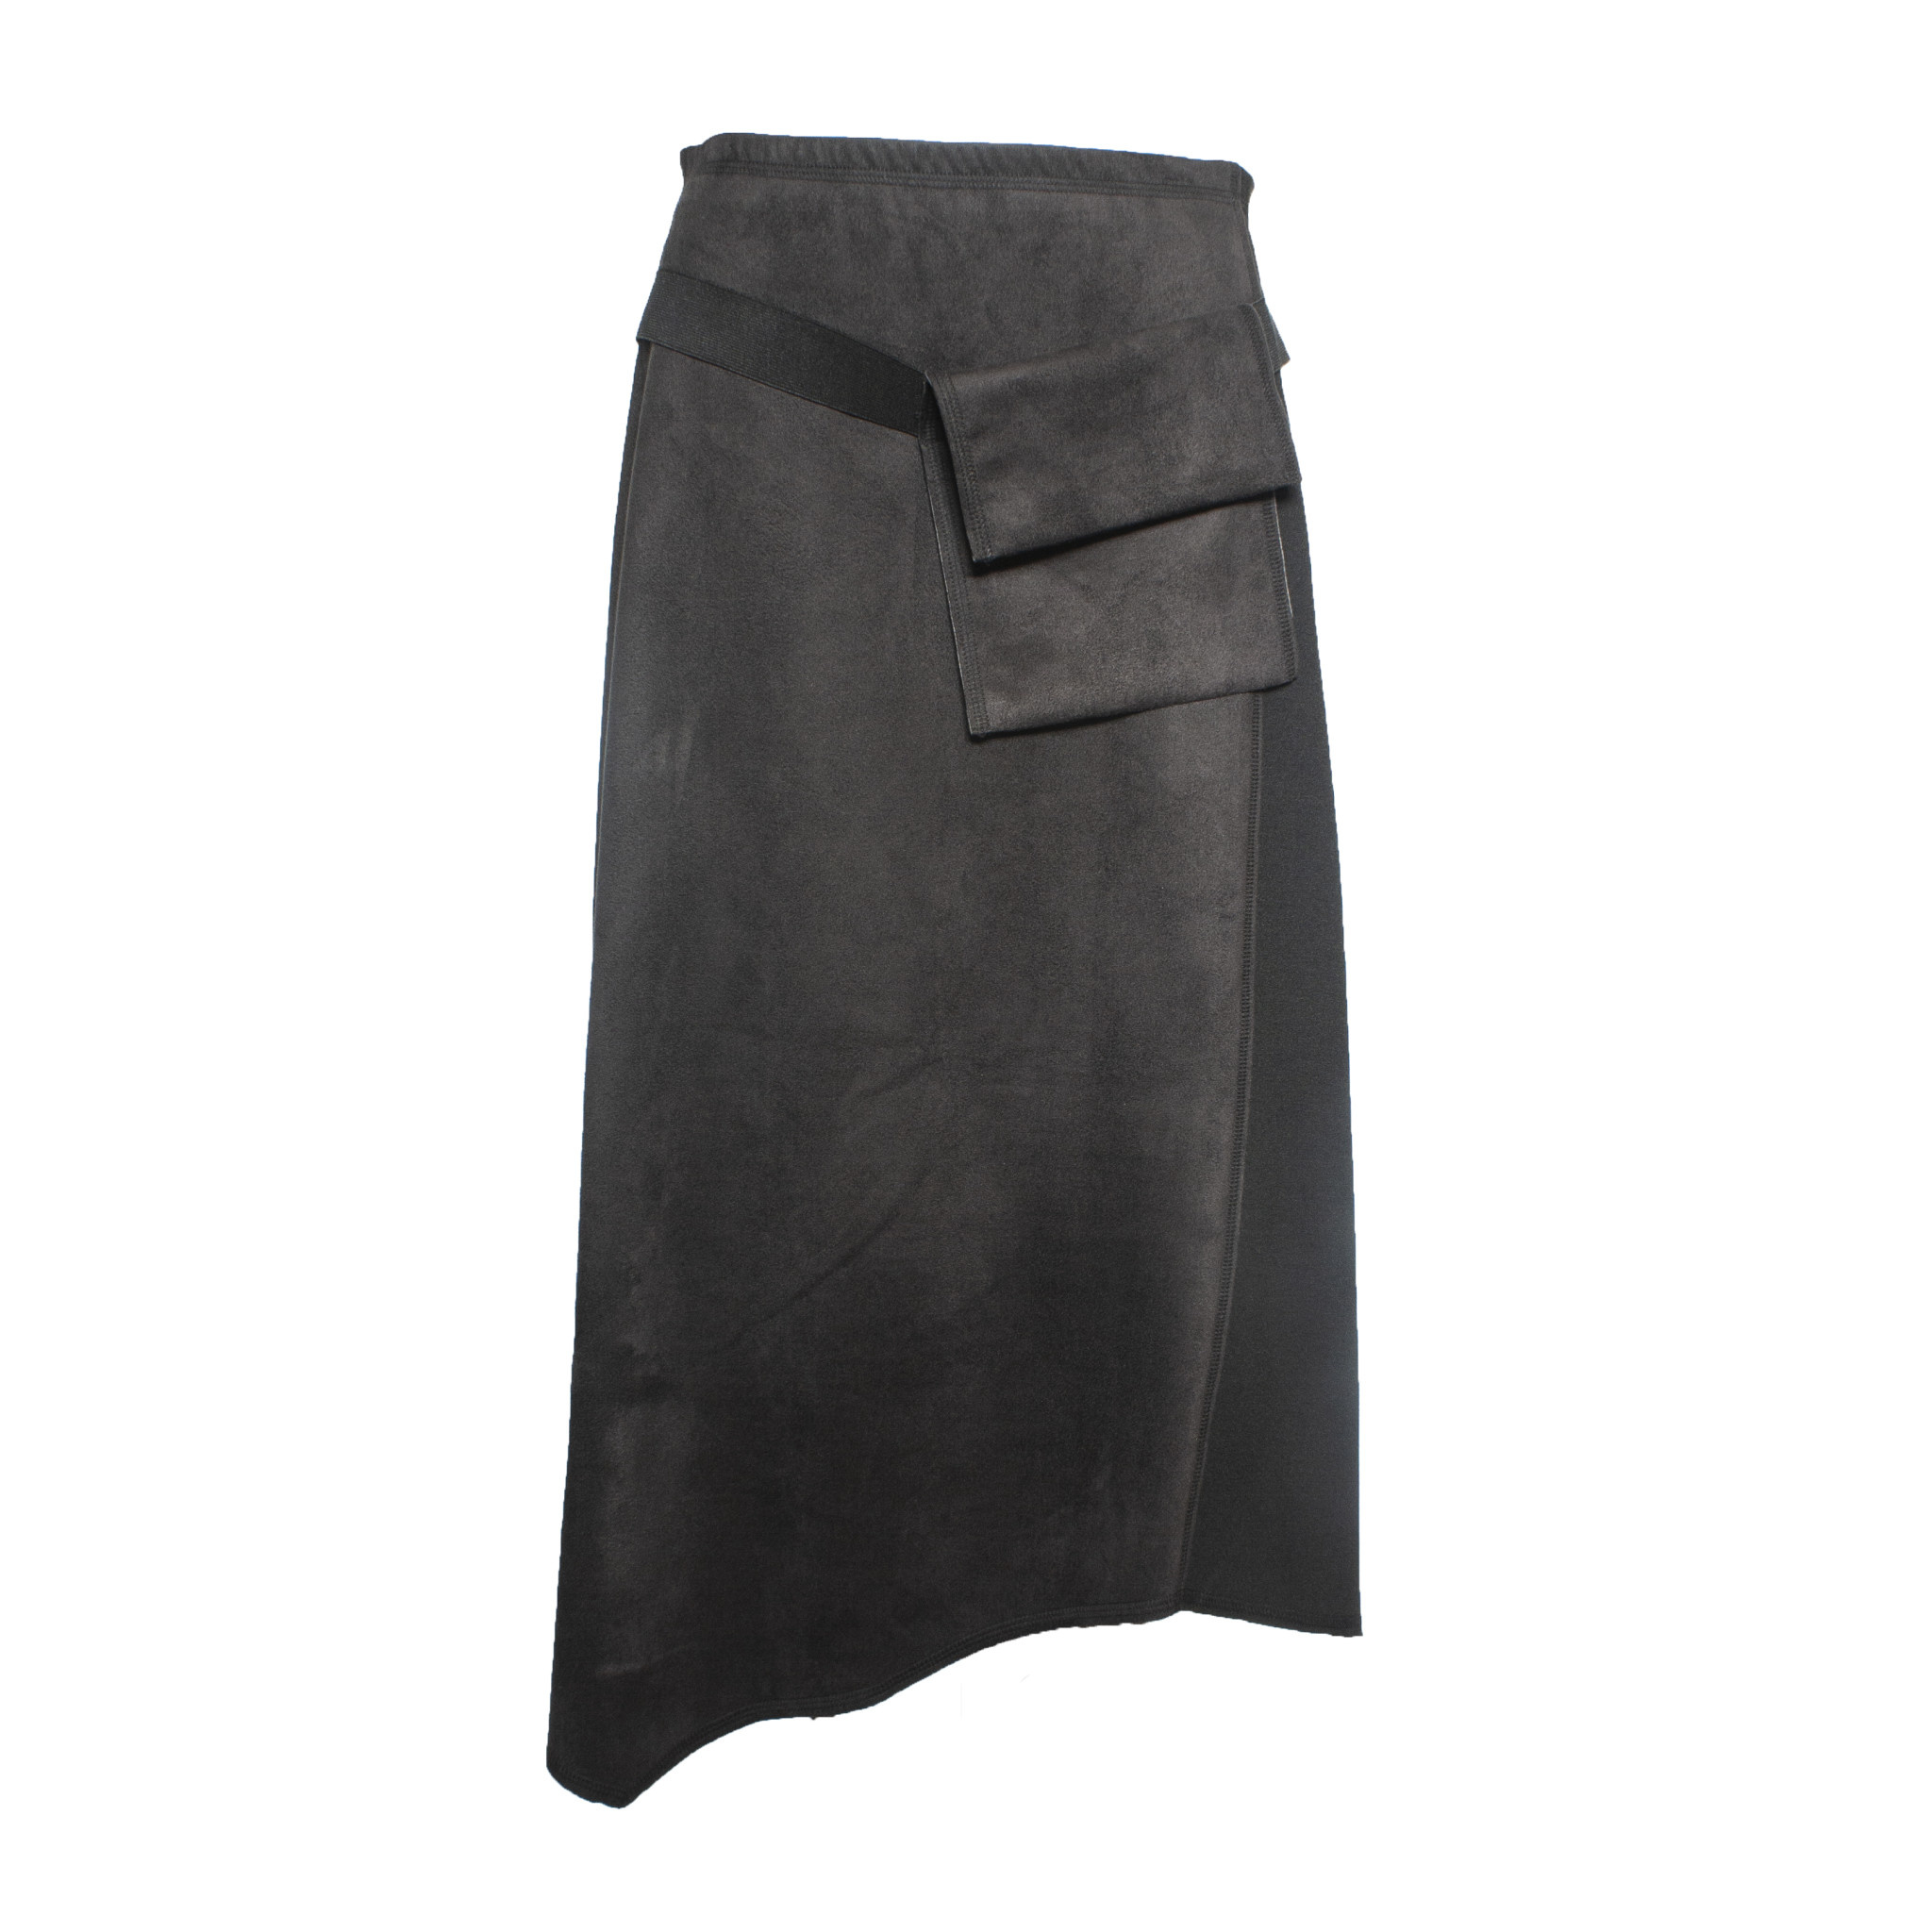 Xenia Xenia Bota Skirt - Black